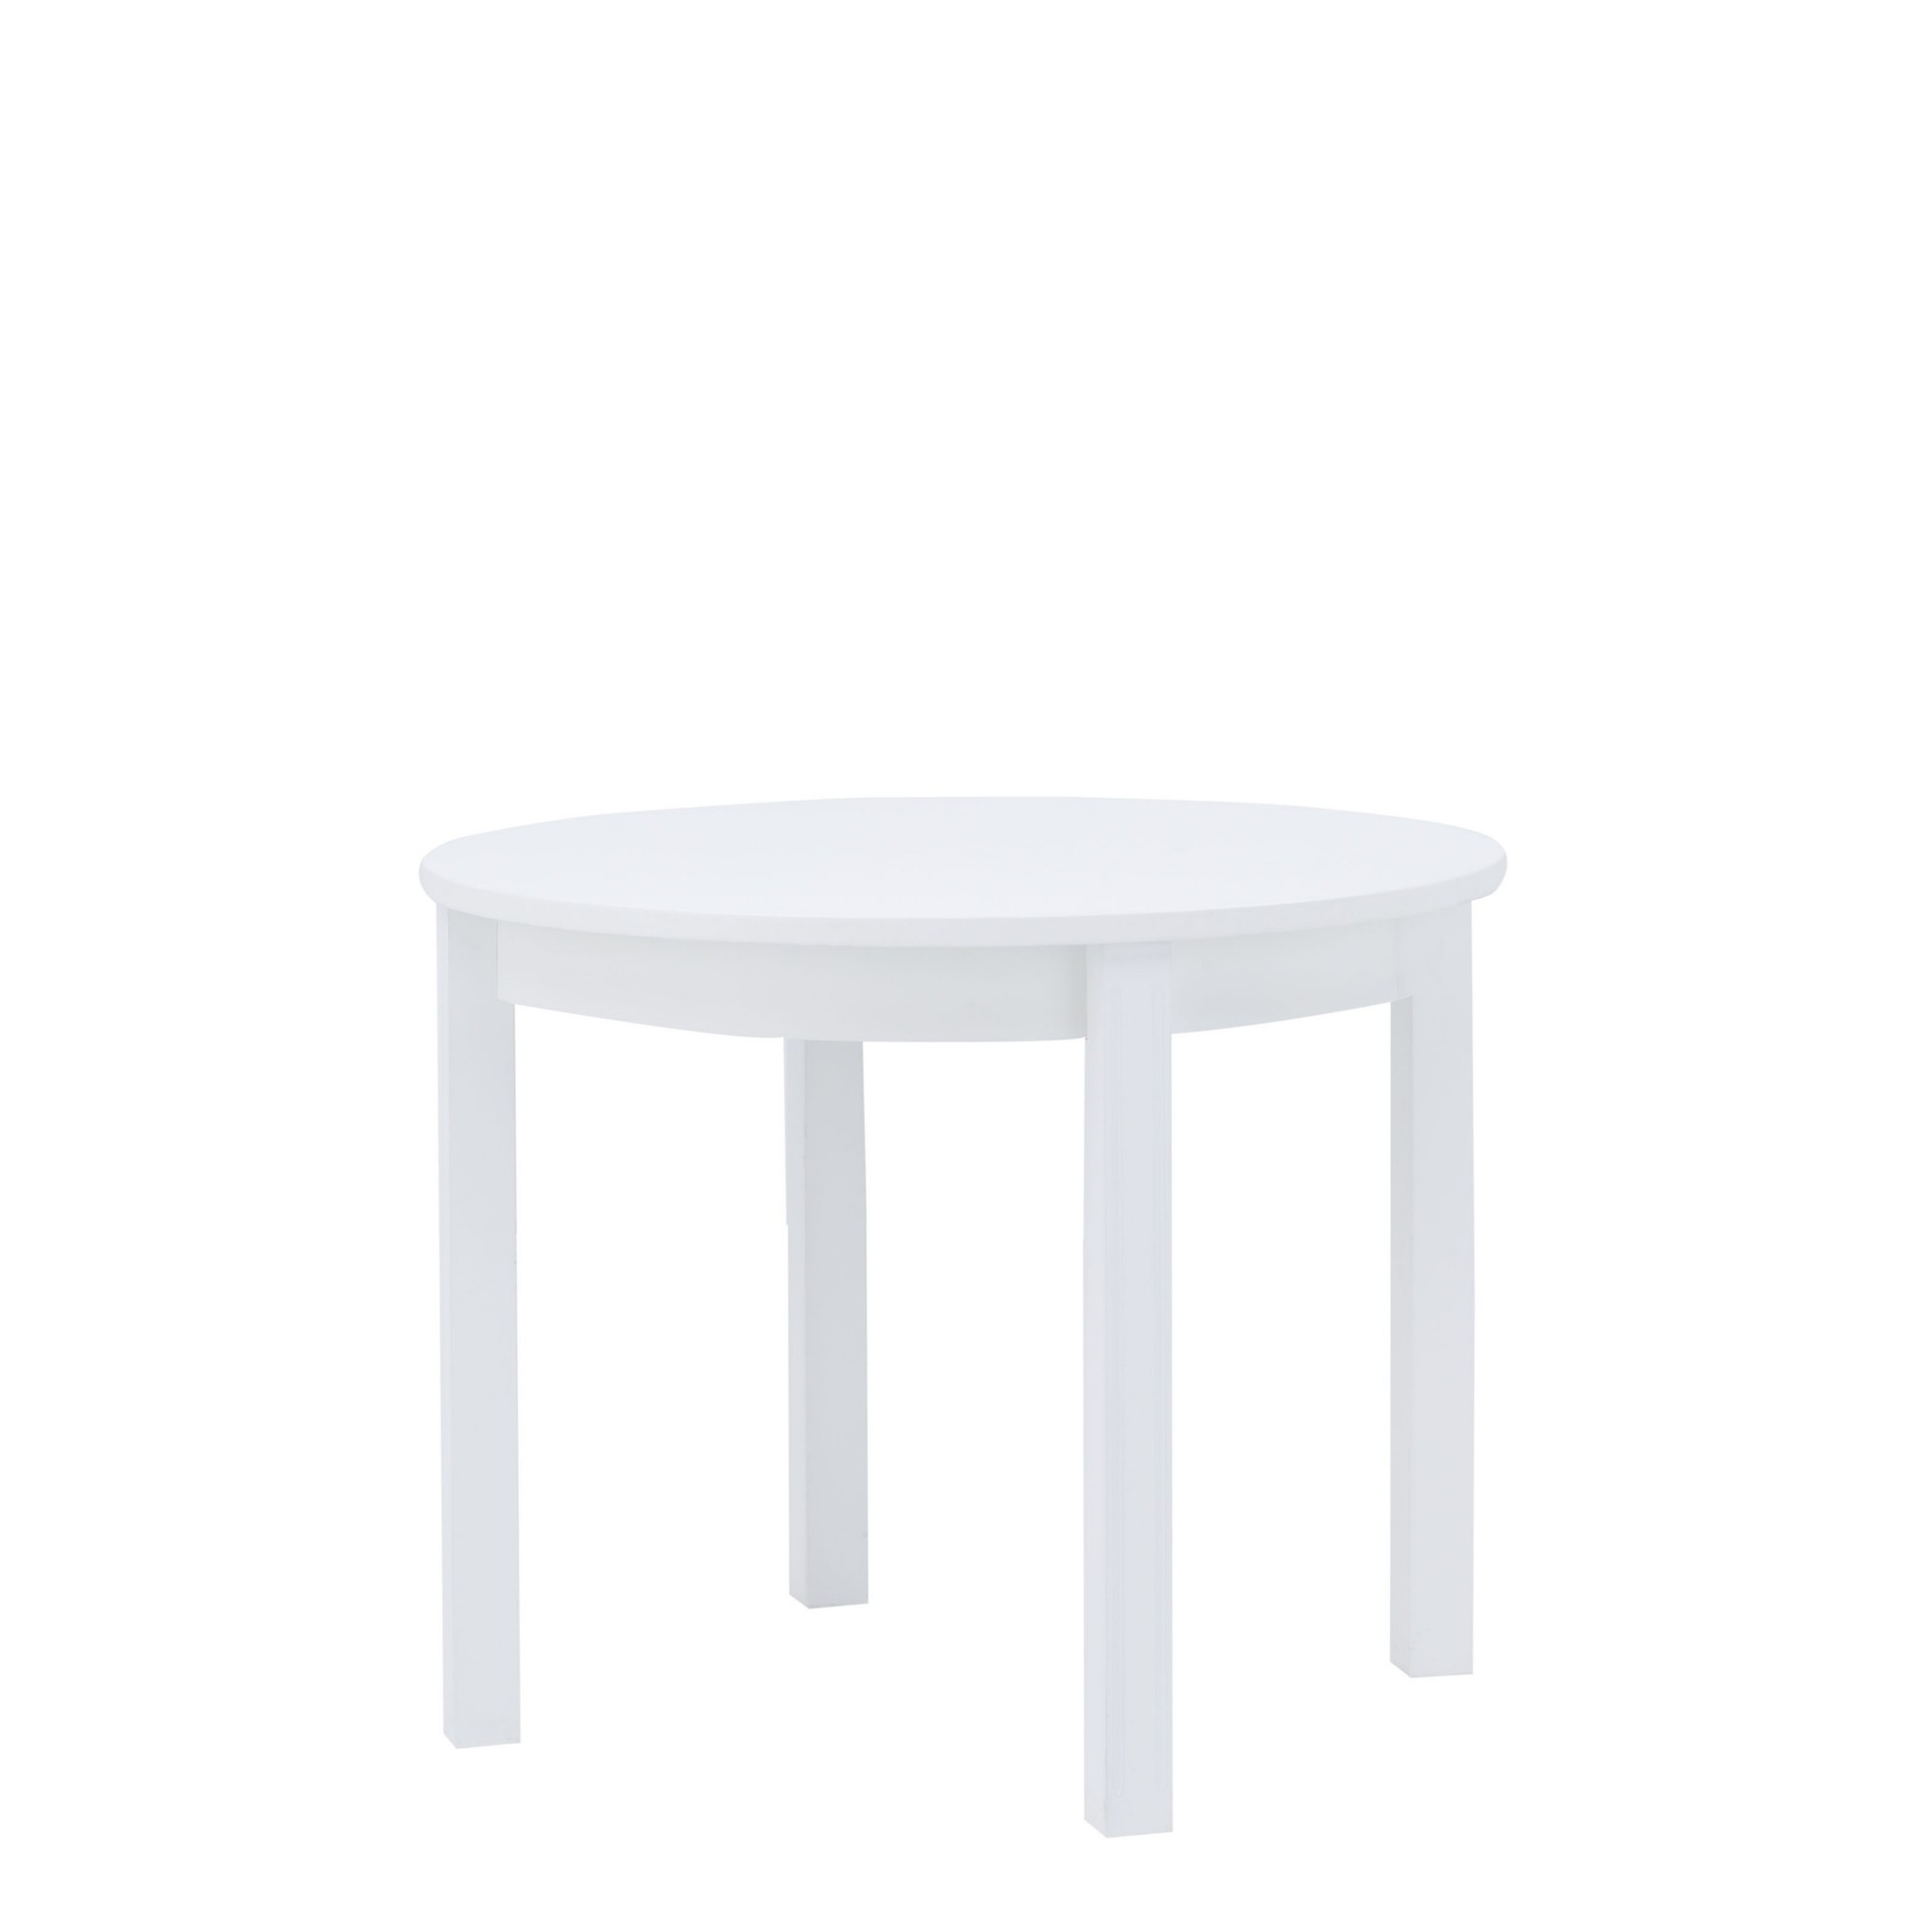 Stół Rozkładany Valentino 1 Salony Agata